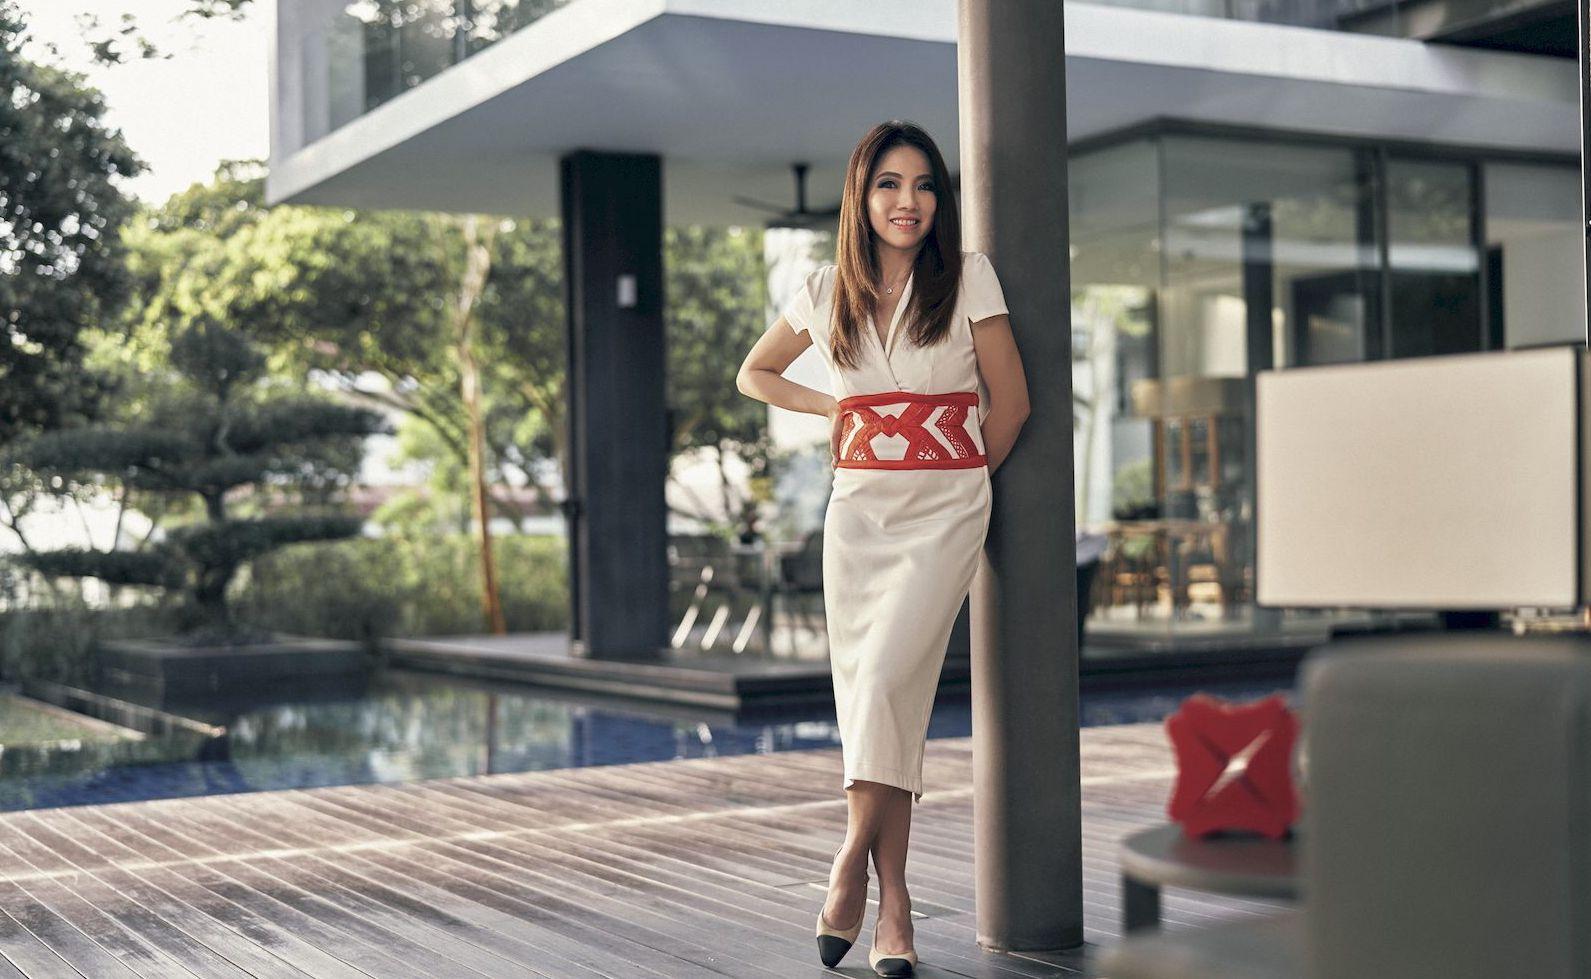 Tan Su Shan is no stranger to establishing organisations that empower women